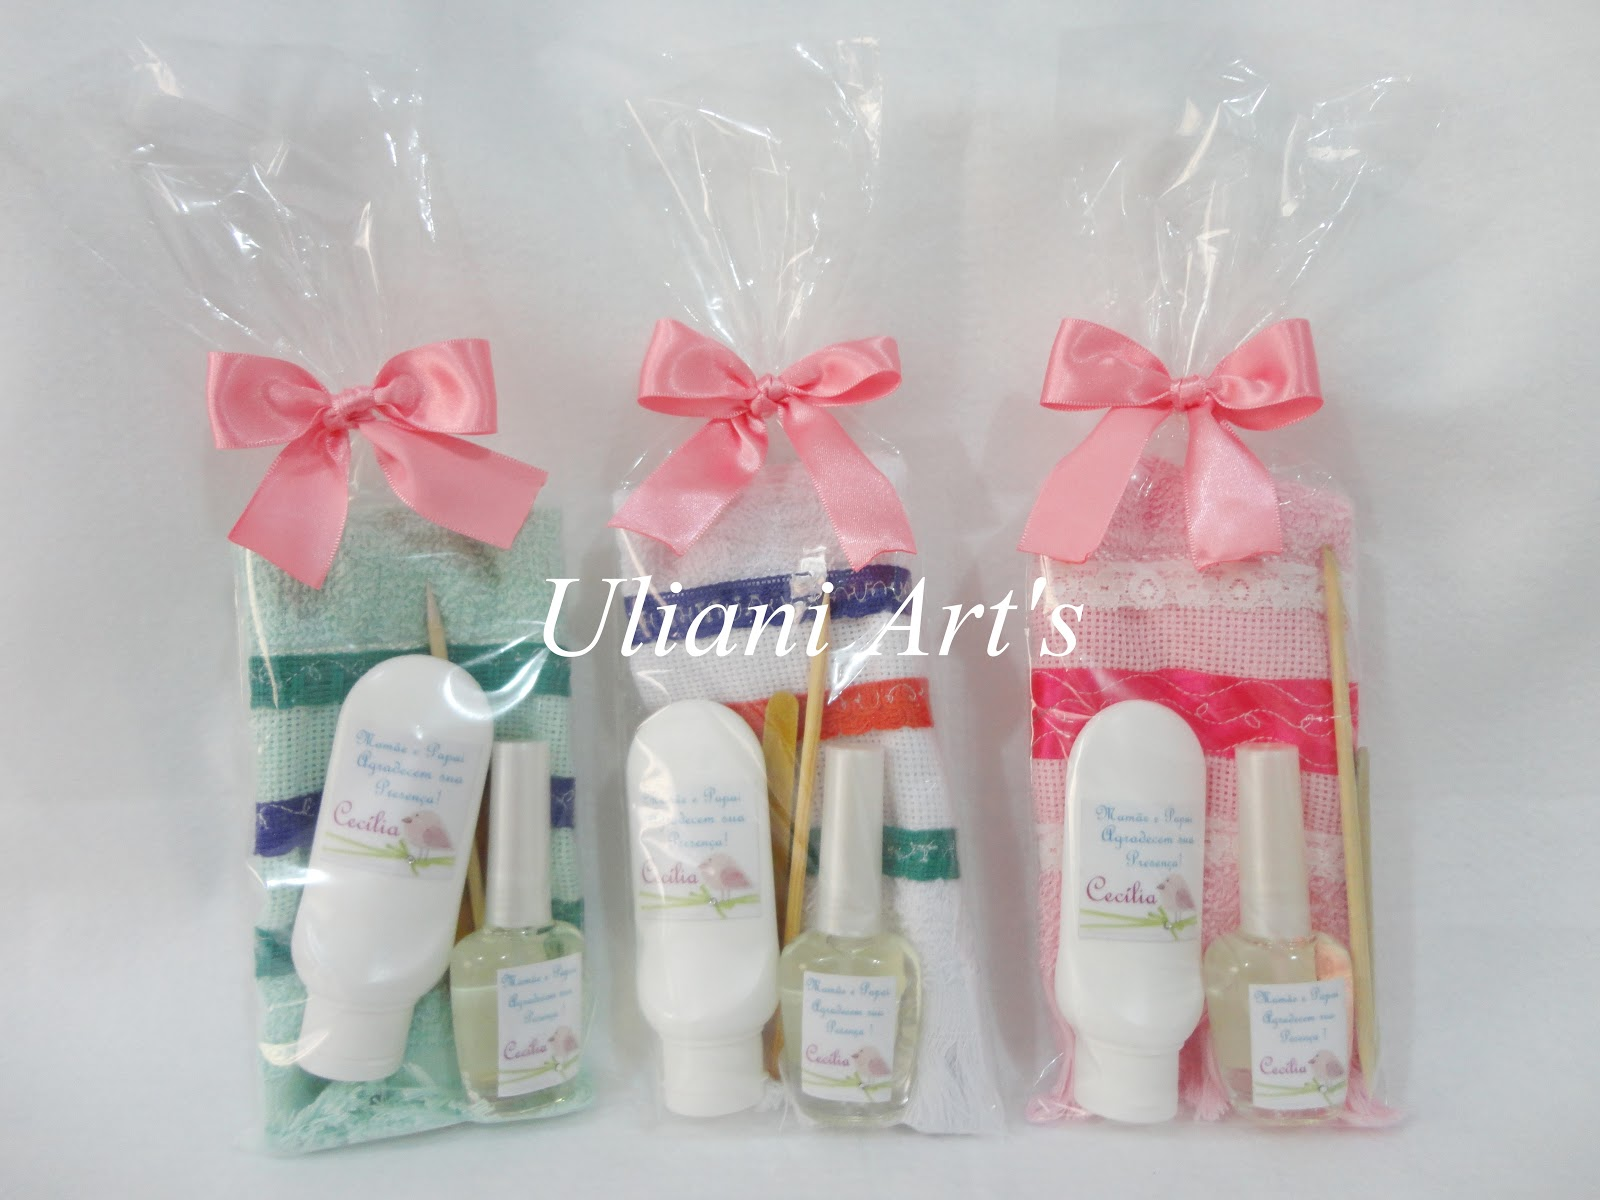 Uliani Art S Cod 100 055 Kit Manicure 2